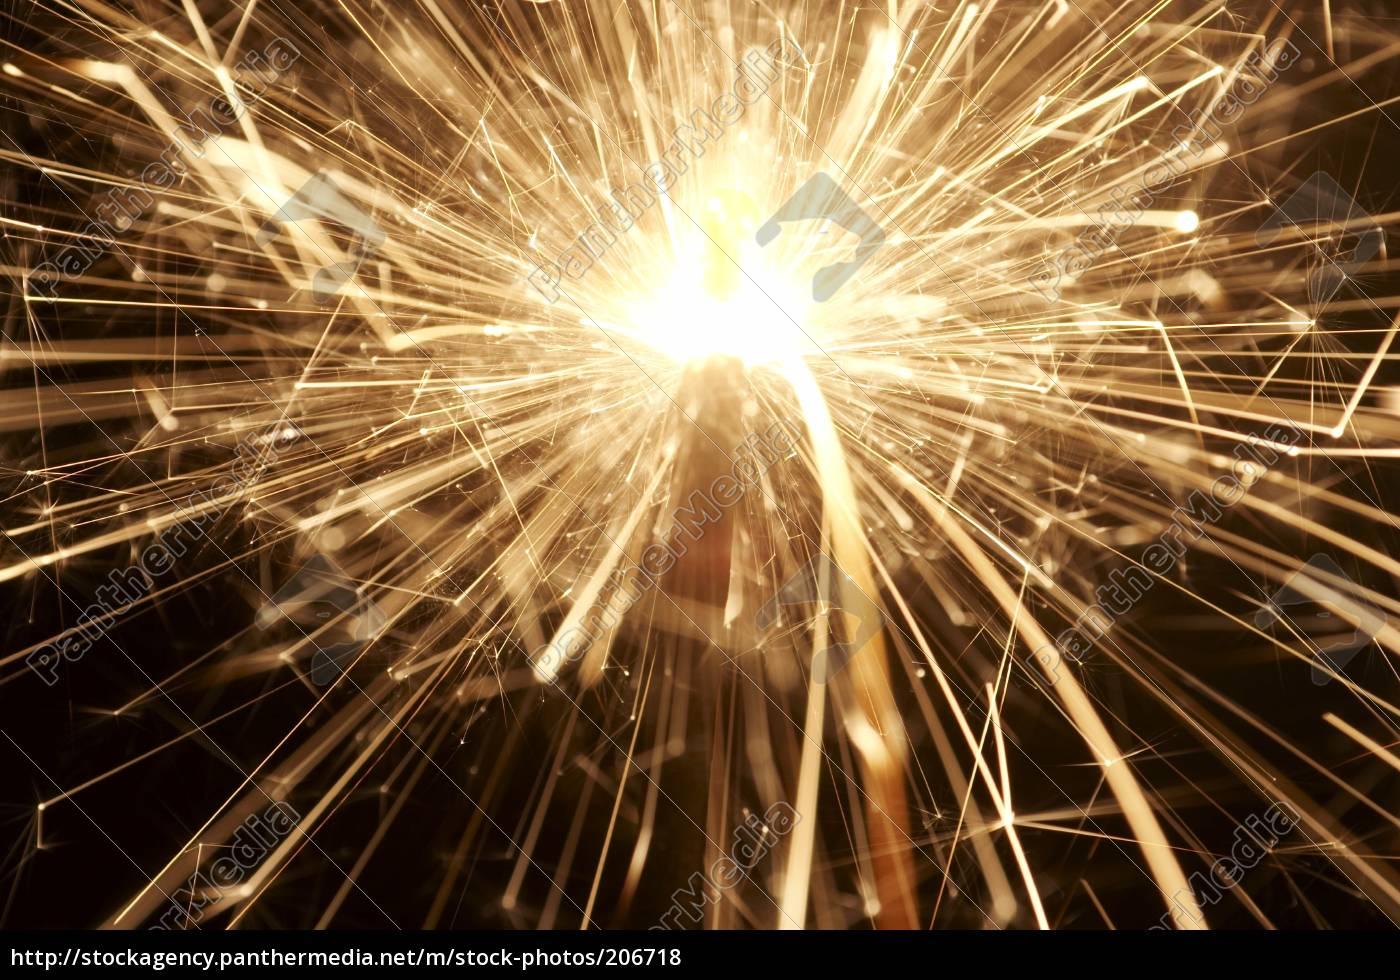 sparkler-1 - 206718